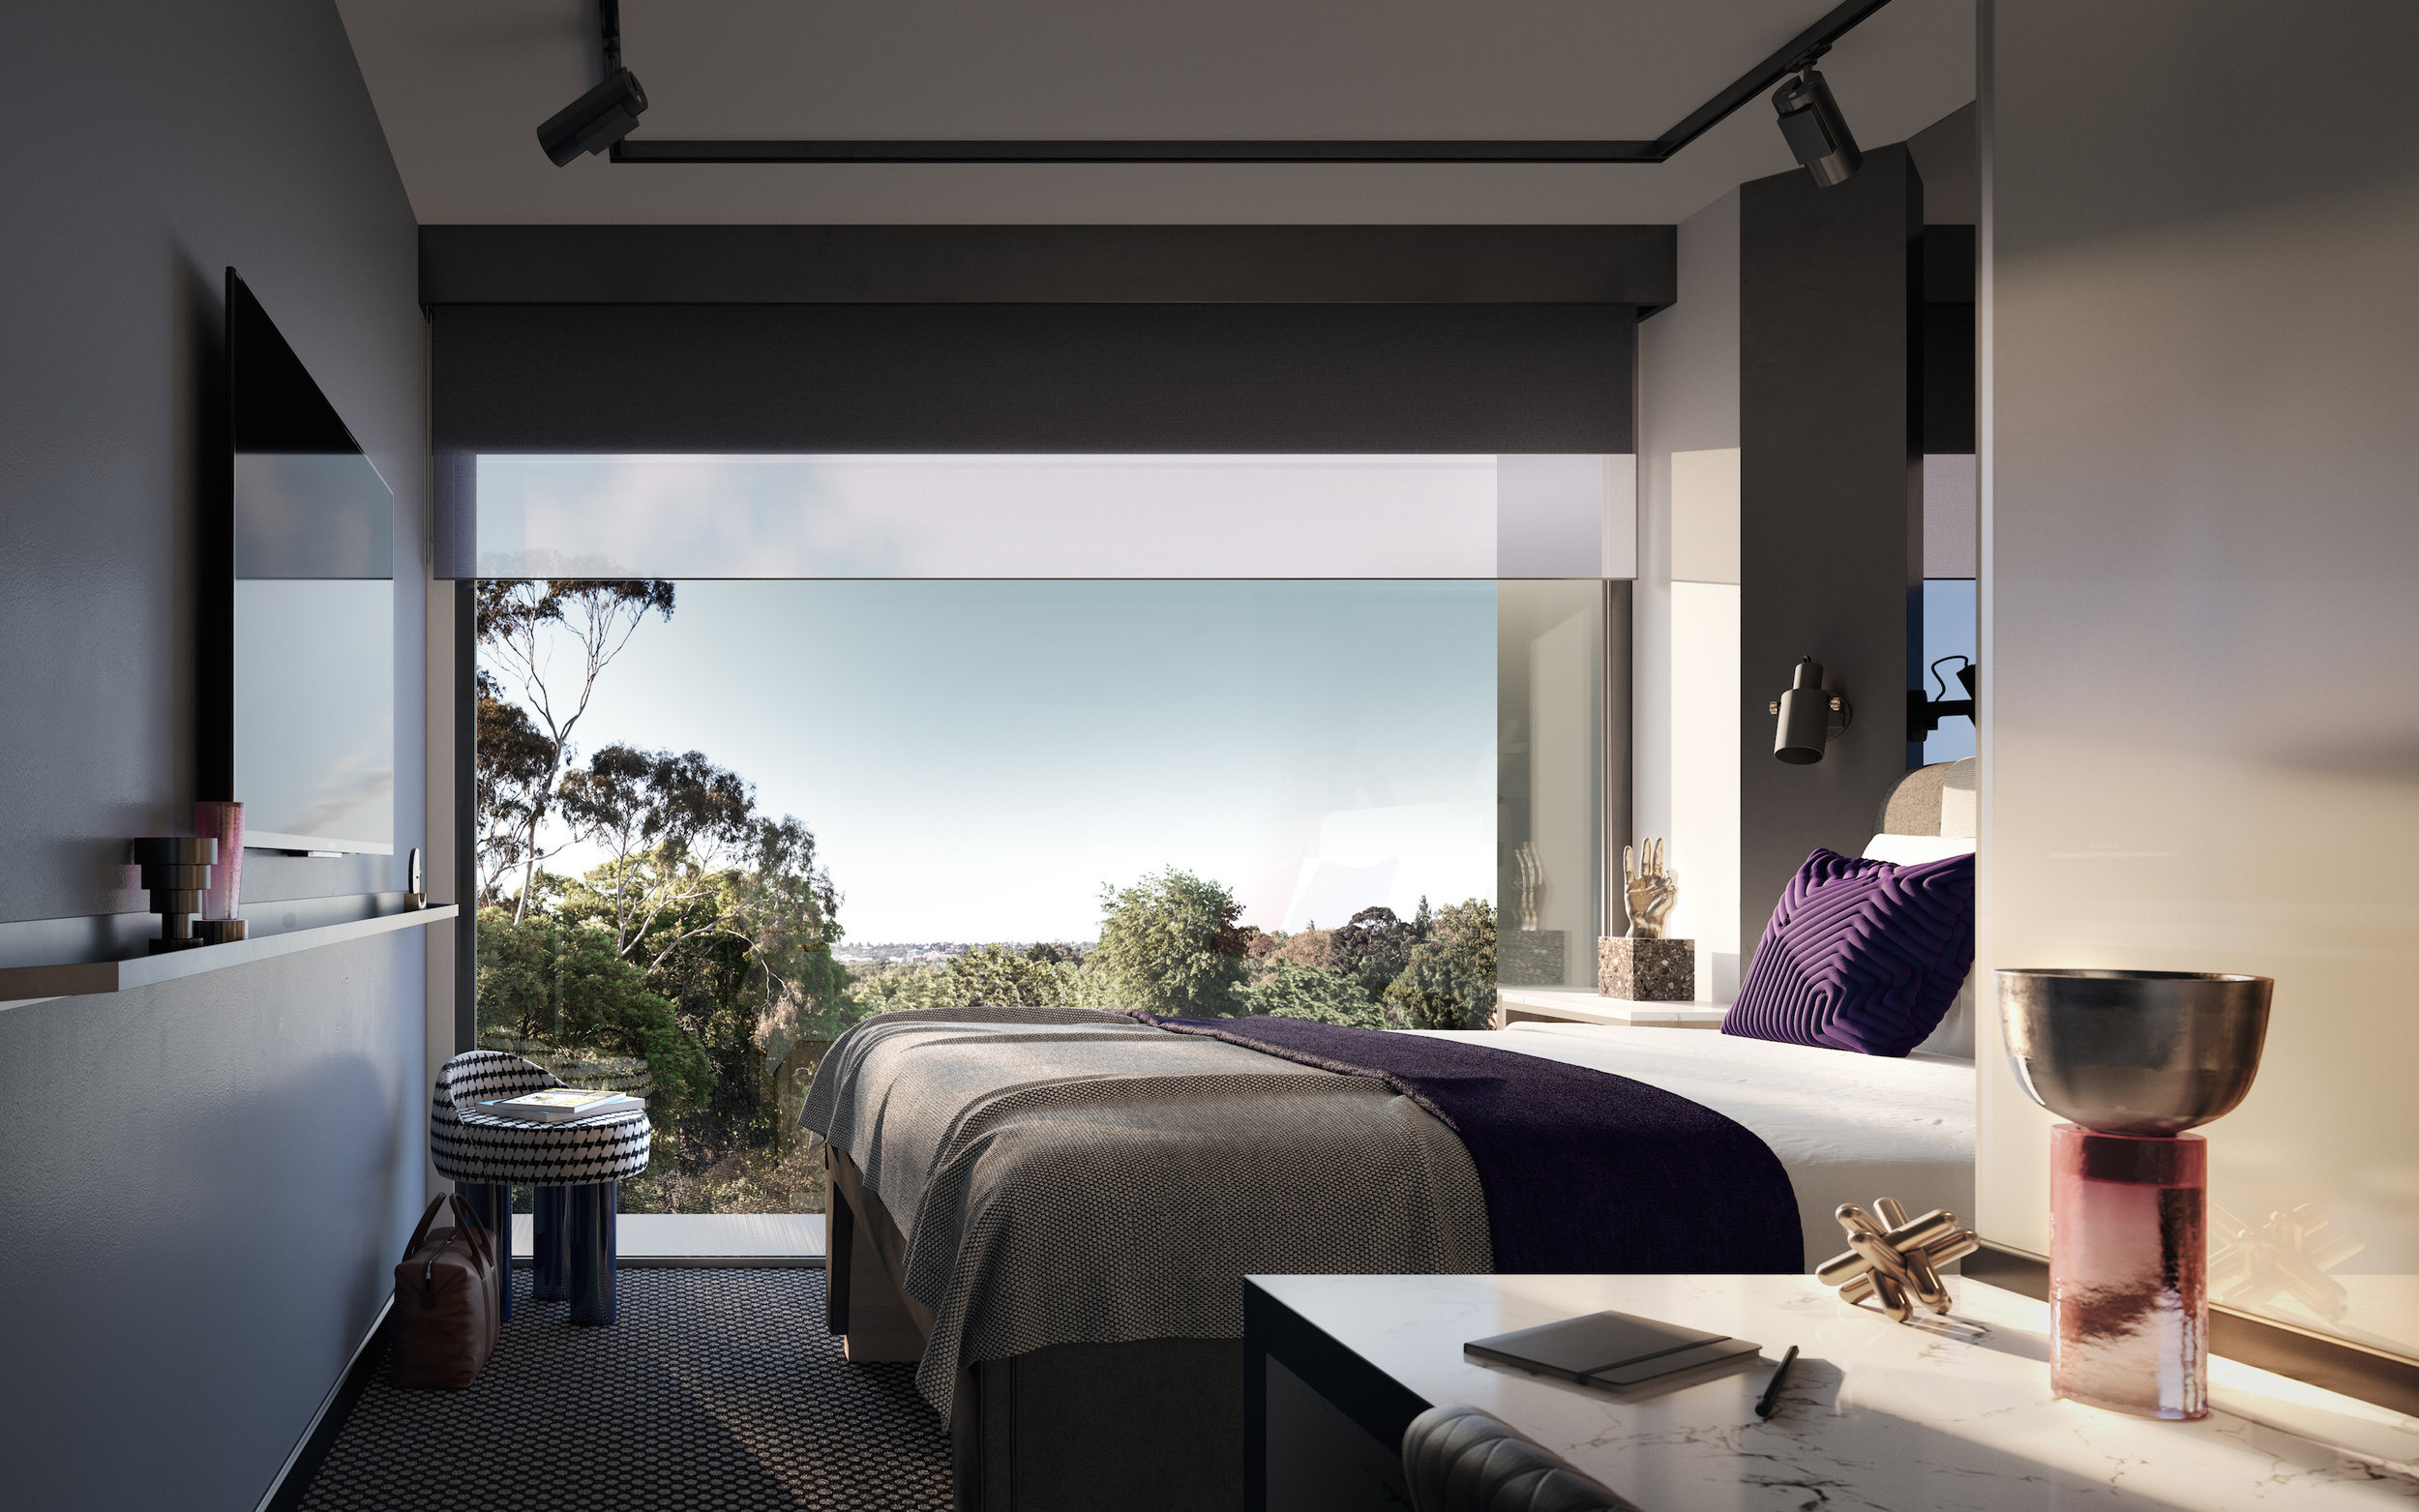 TravMedia_Australia_1212408_1630_21 19 Perth Hotel - Room_REVB.jpg